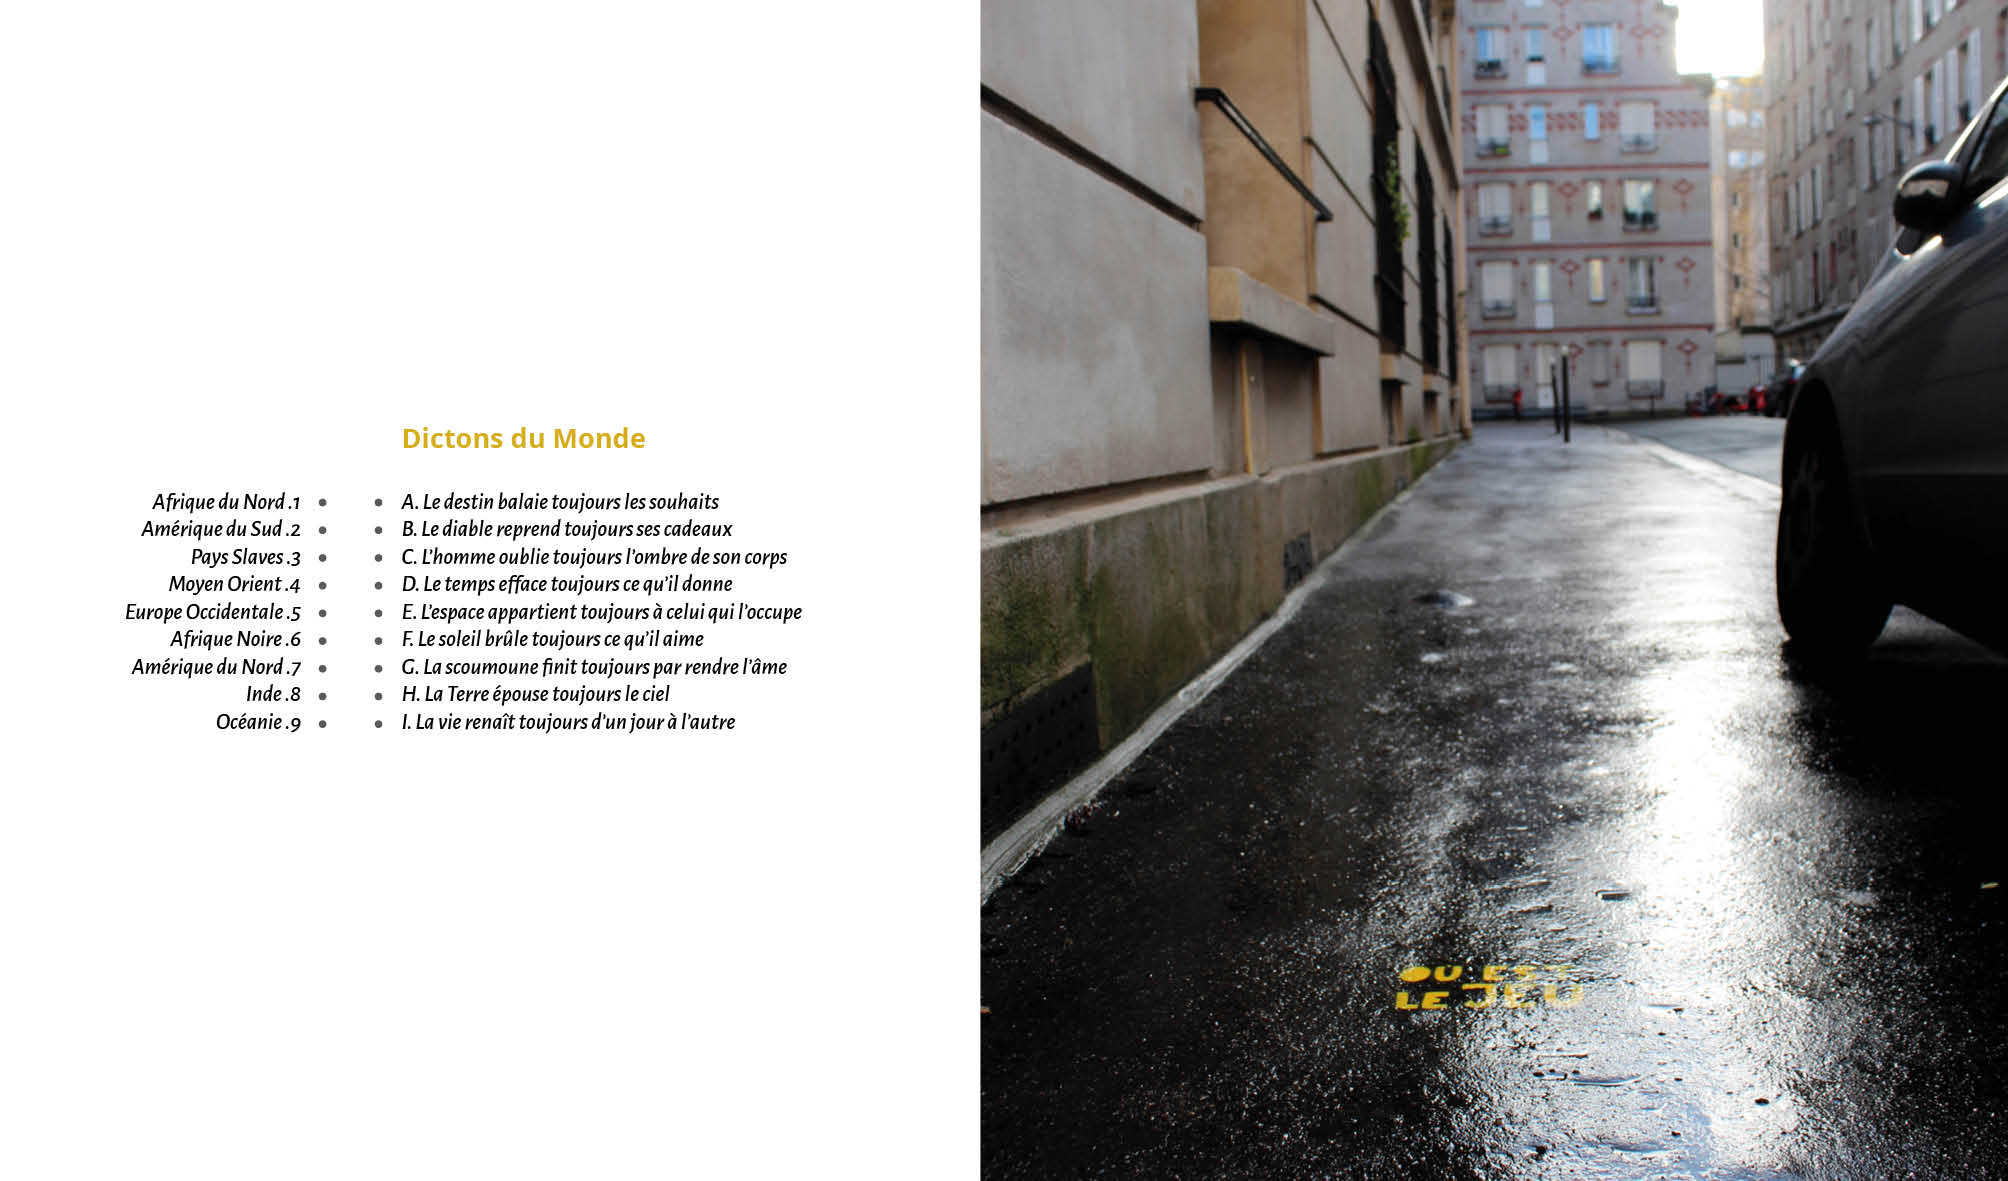 collages_collateraux_despeysses_pablo_philippe23